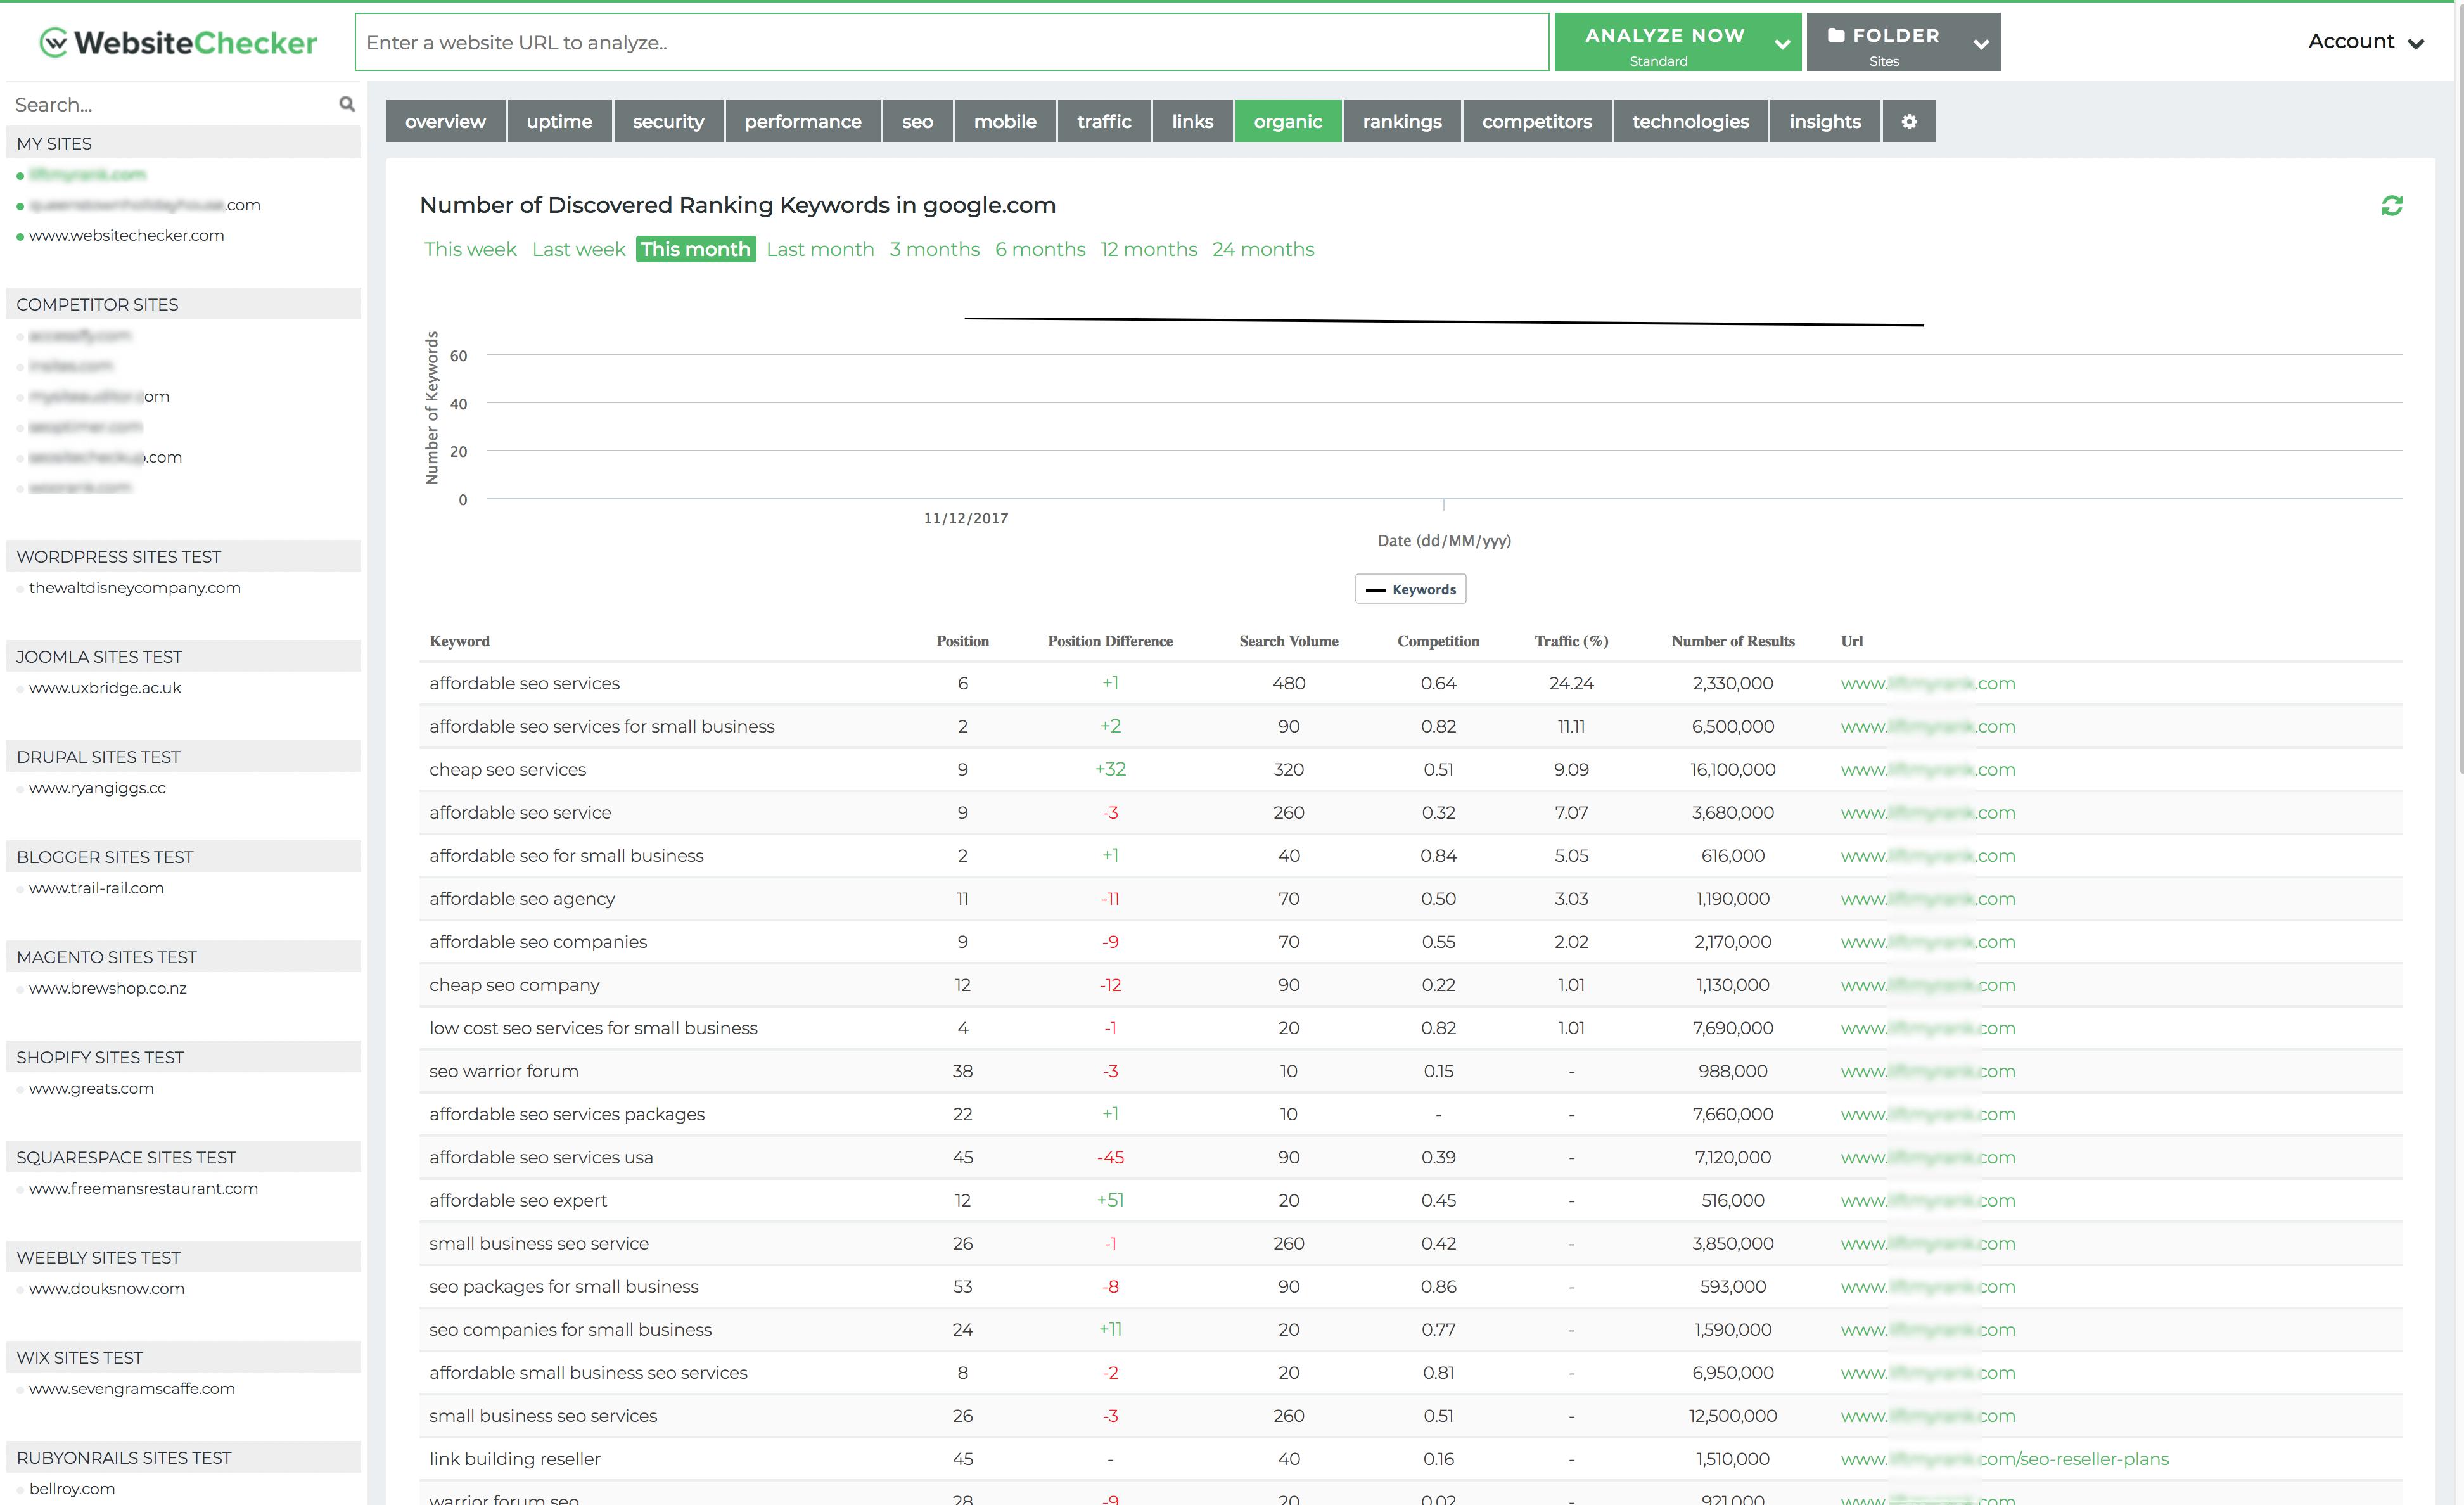 Find Keywords Ranking